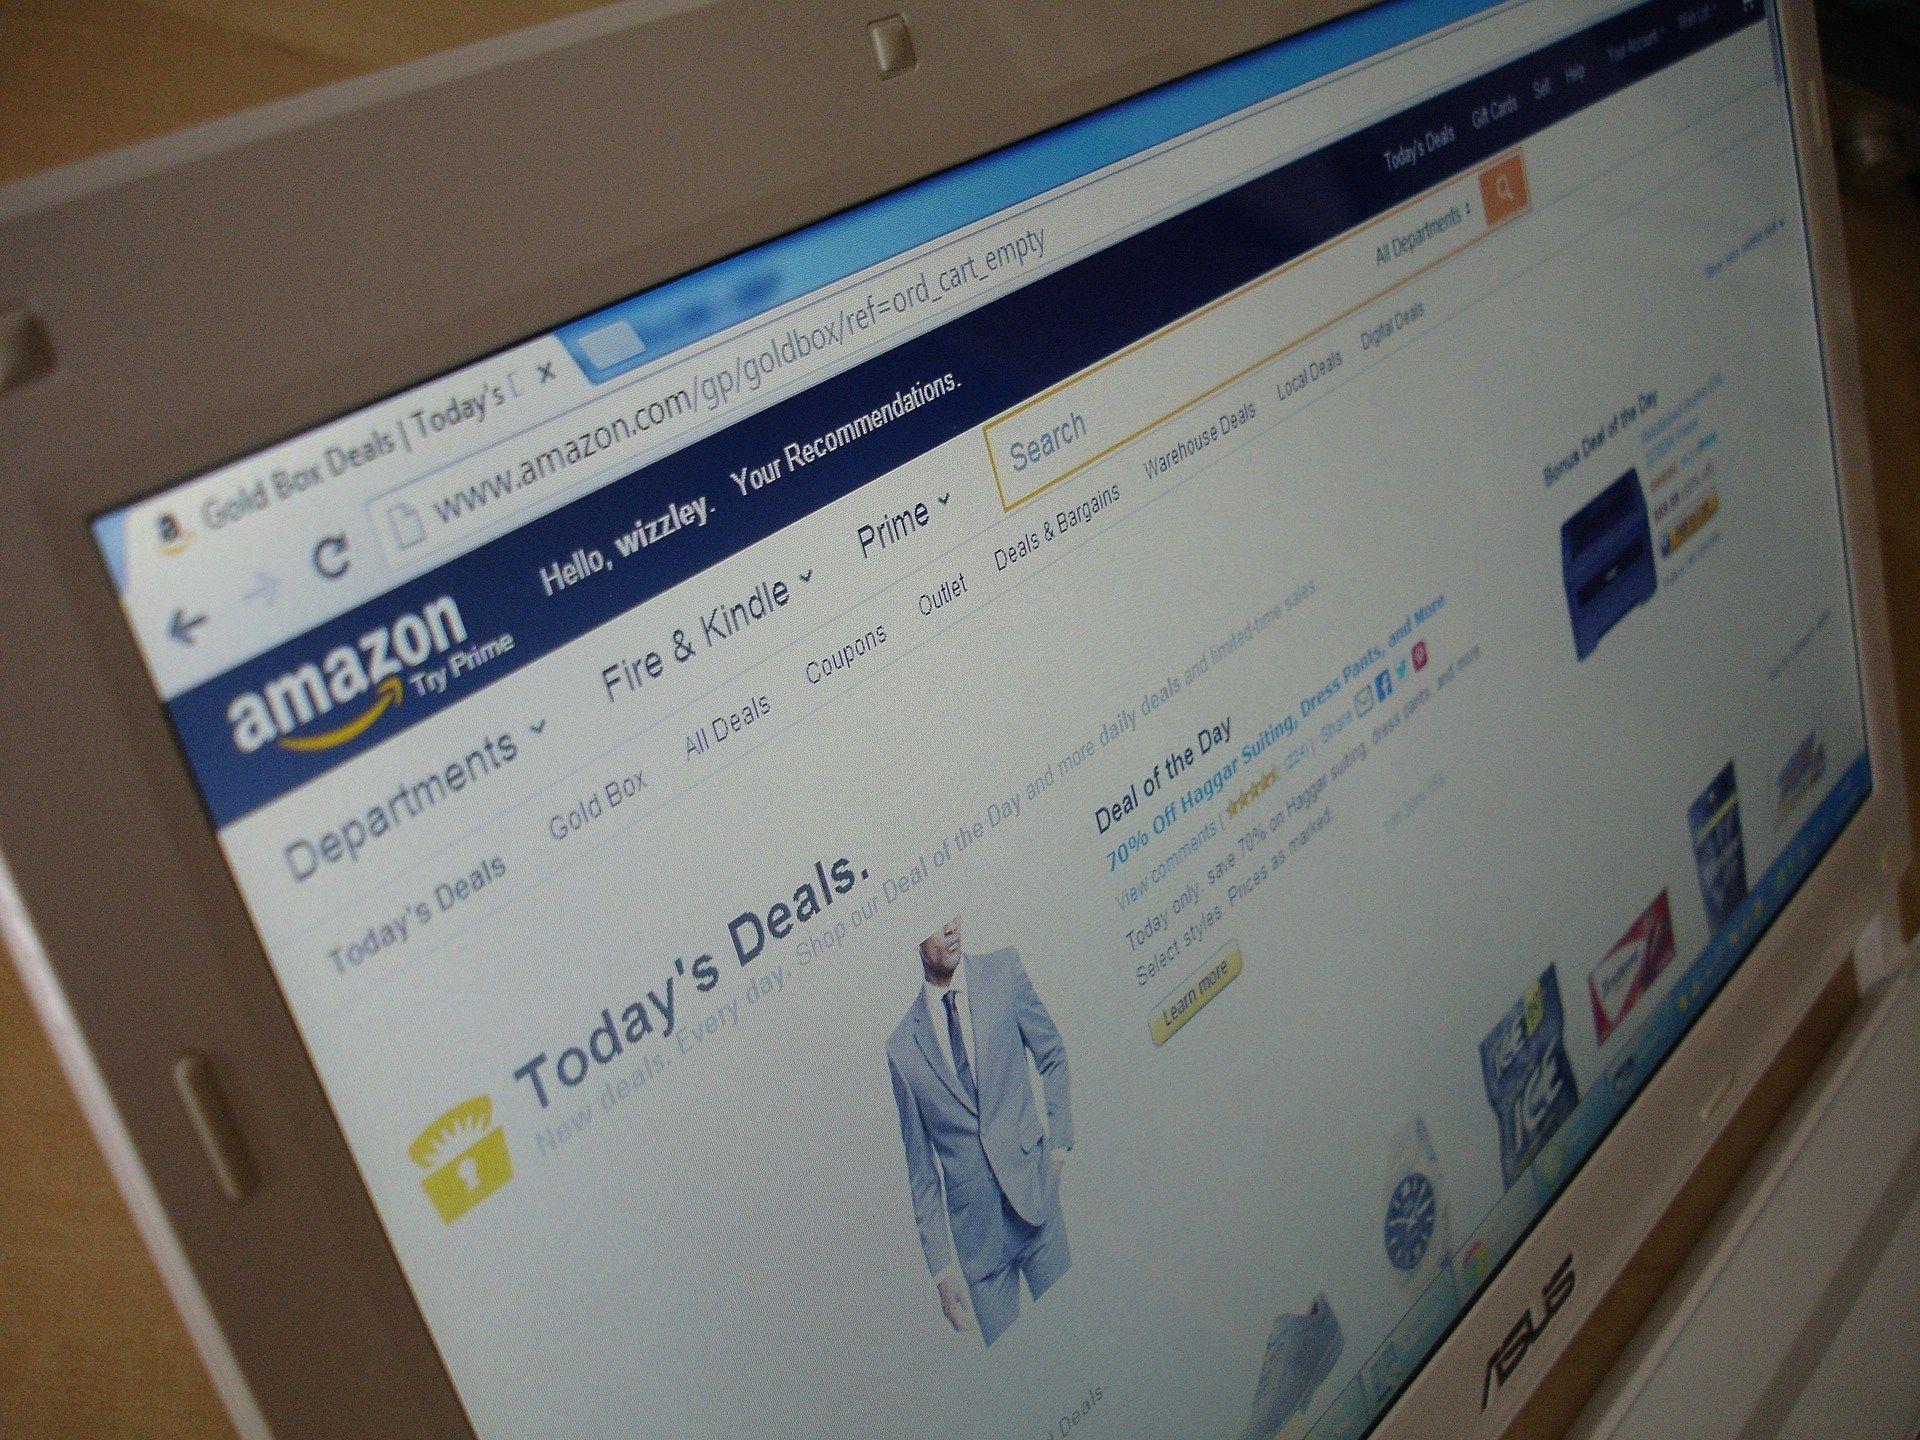 7 Ways To Make Money With Amazon